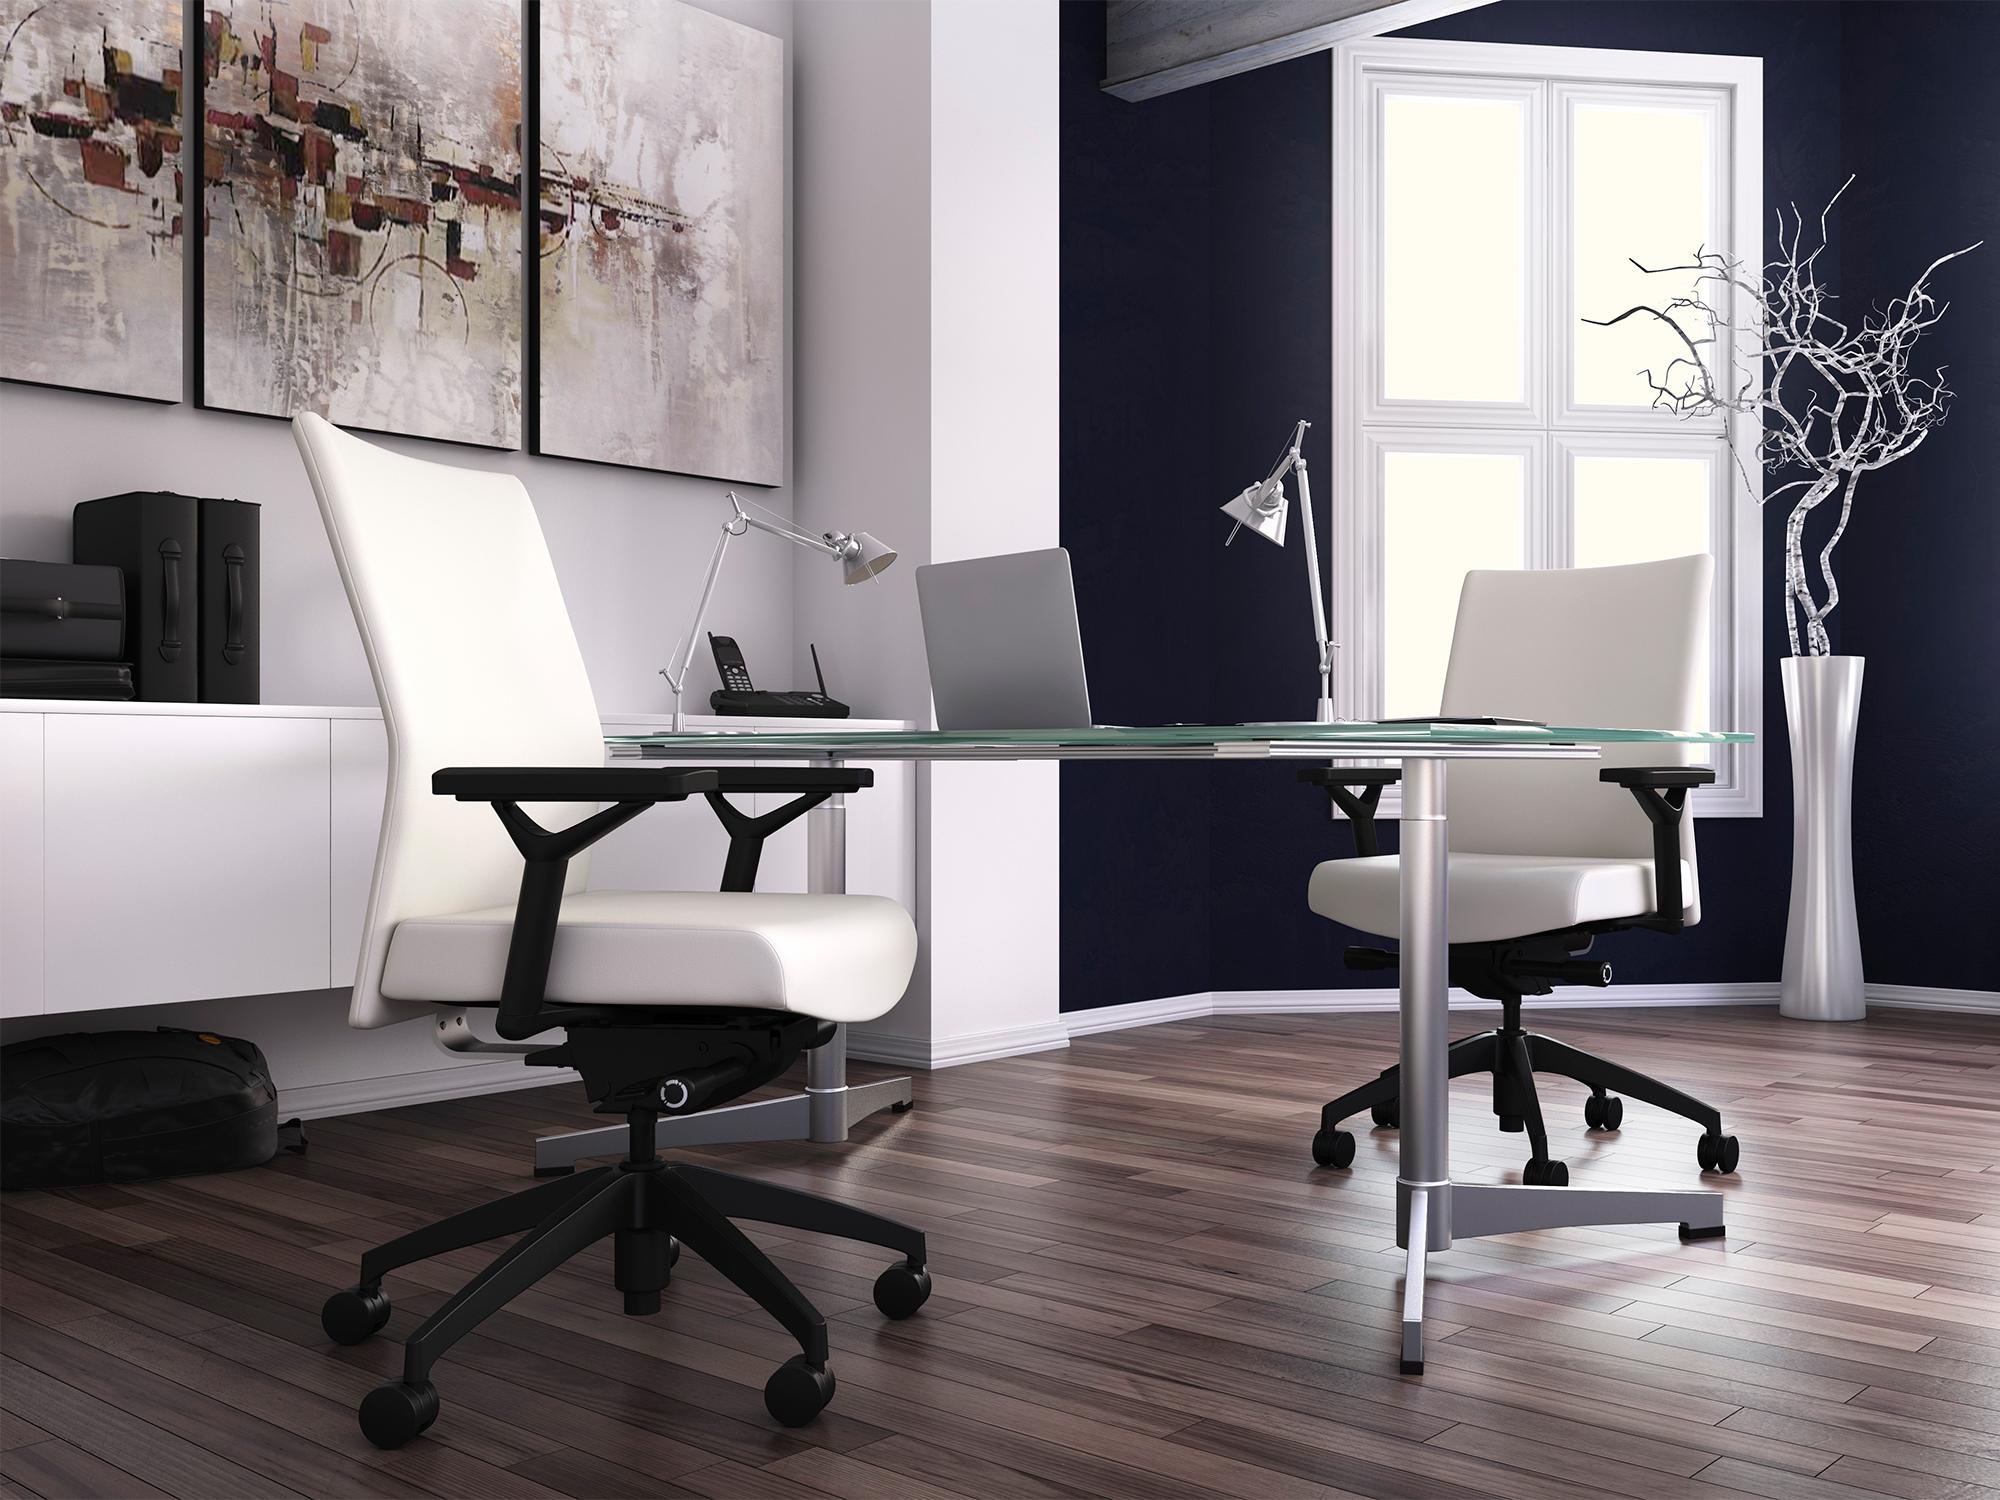 sona_office_environment.jpg